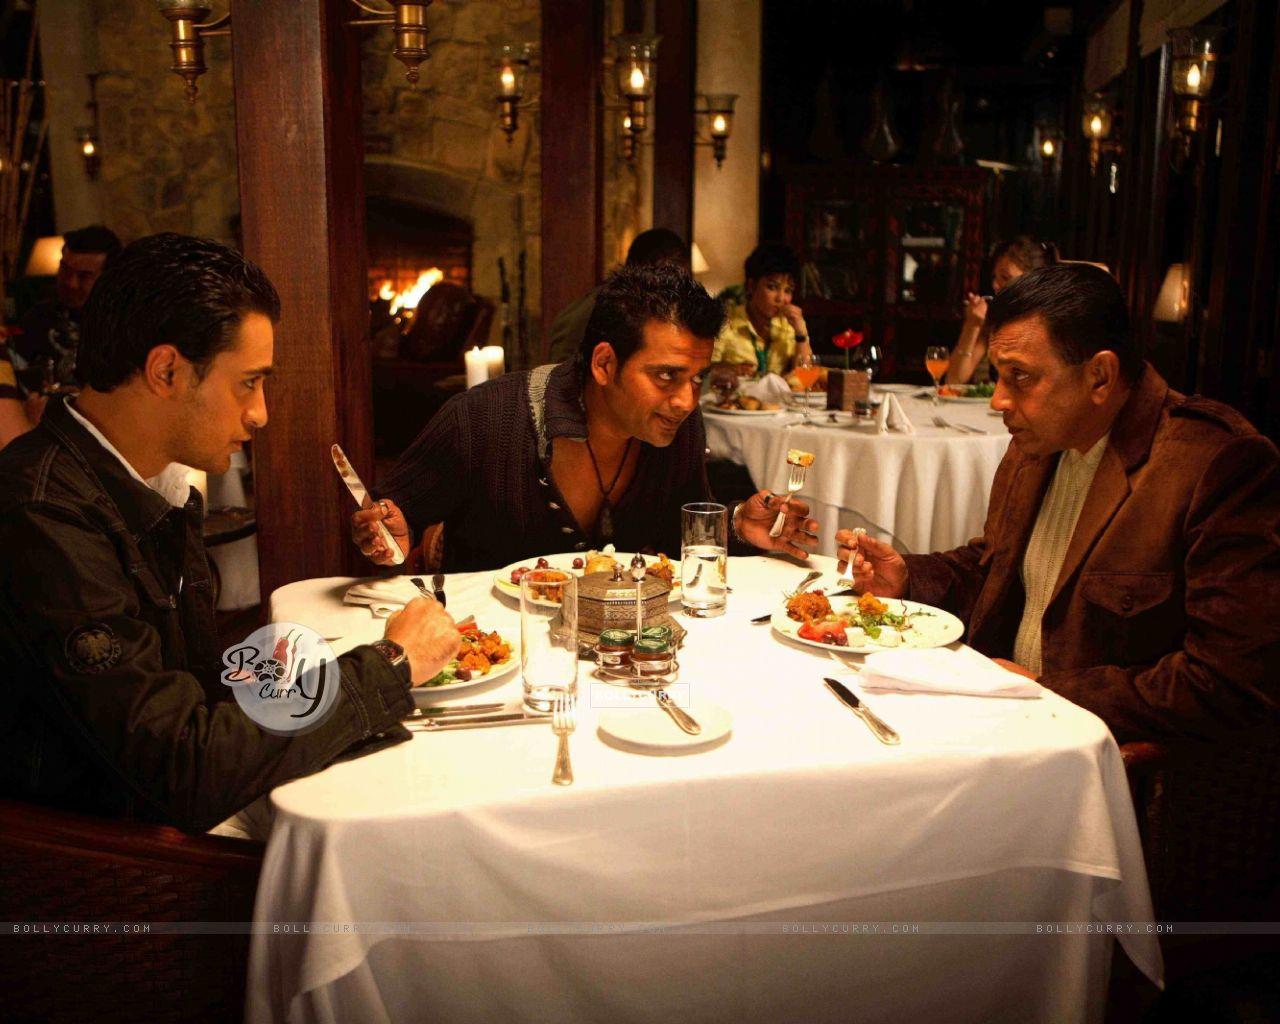 Mithun,Imraan and Ravi having their dinner (15647) size:1280x1024